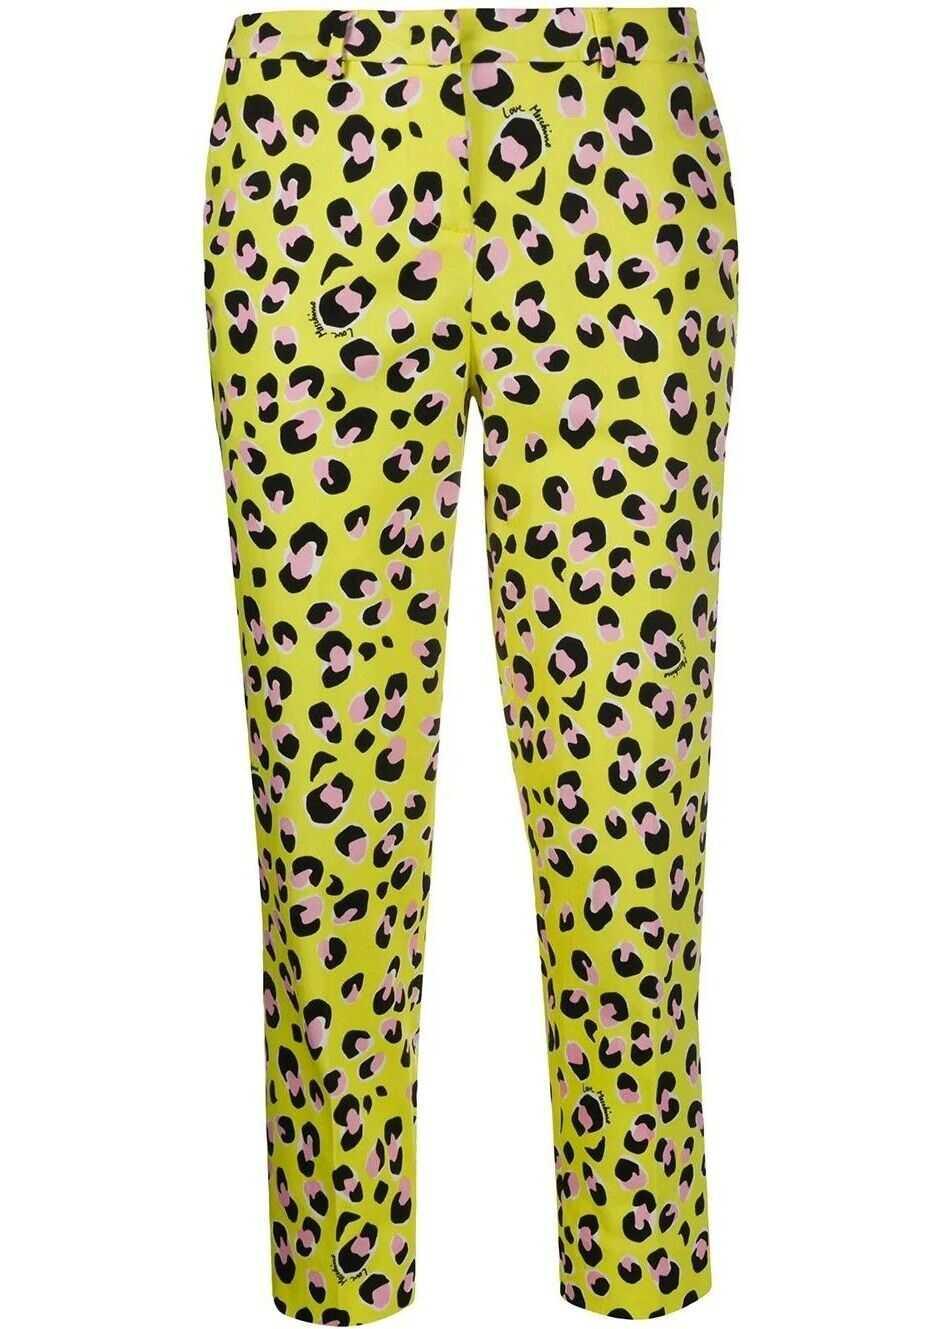 LOVE Moschino Cotton Pants YELLOW